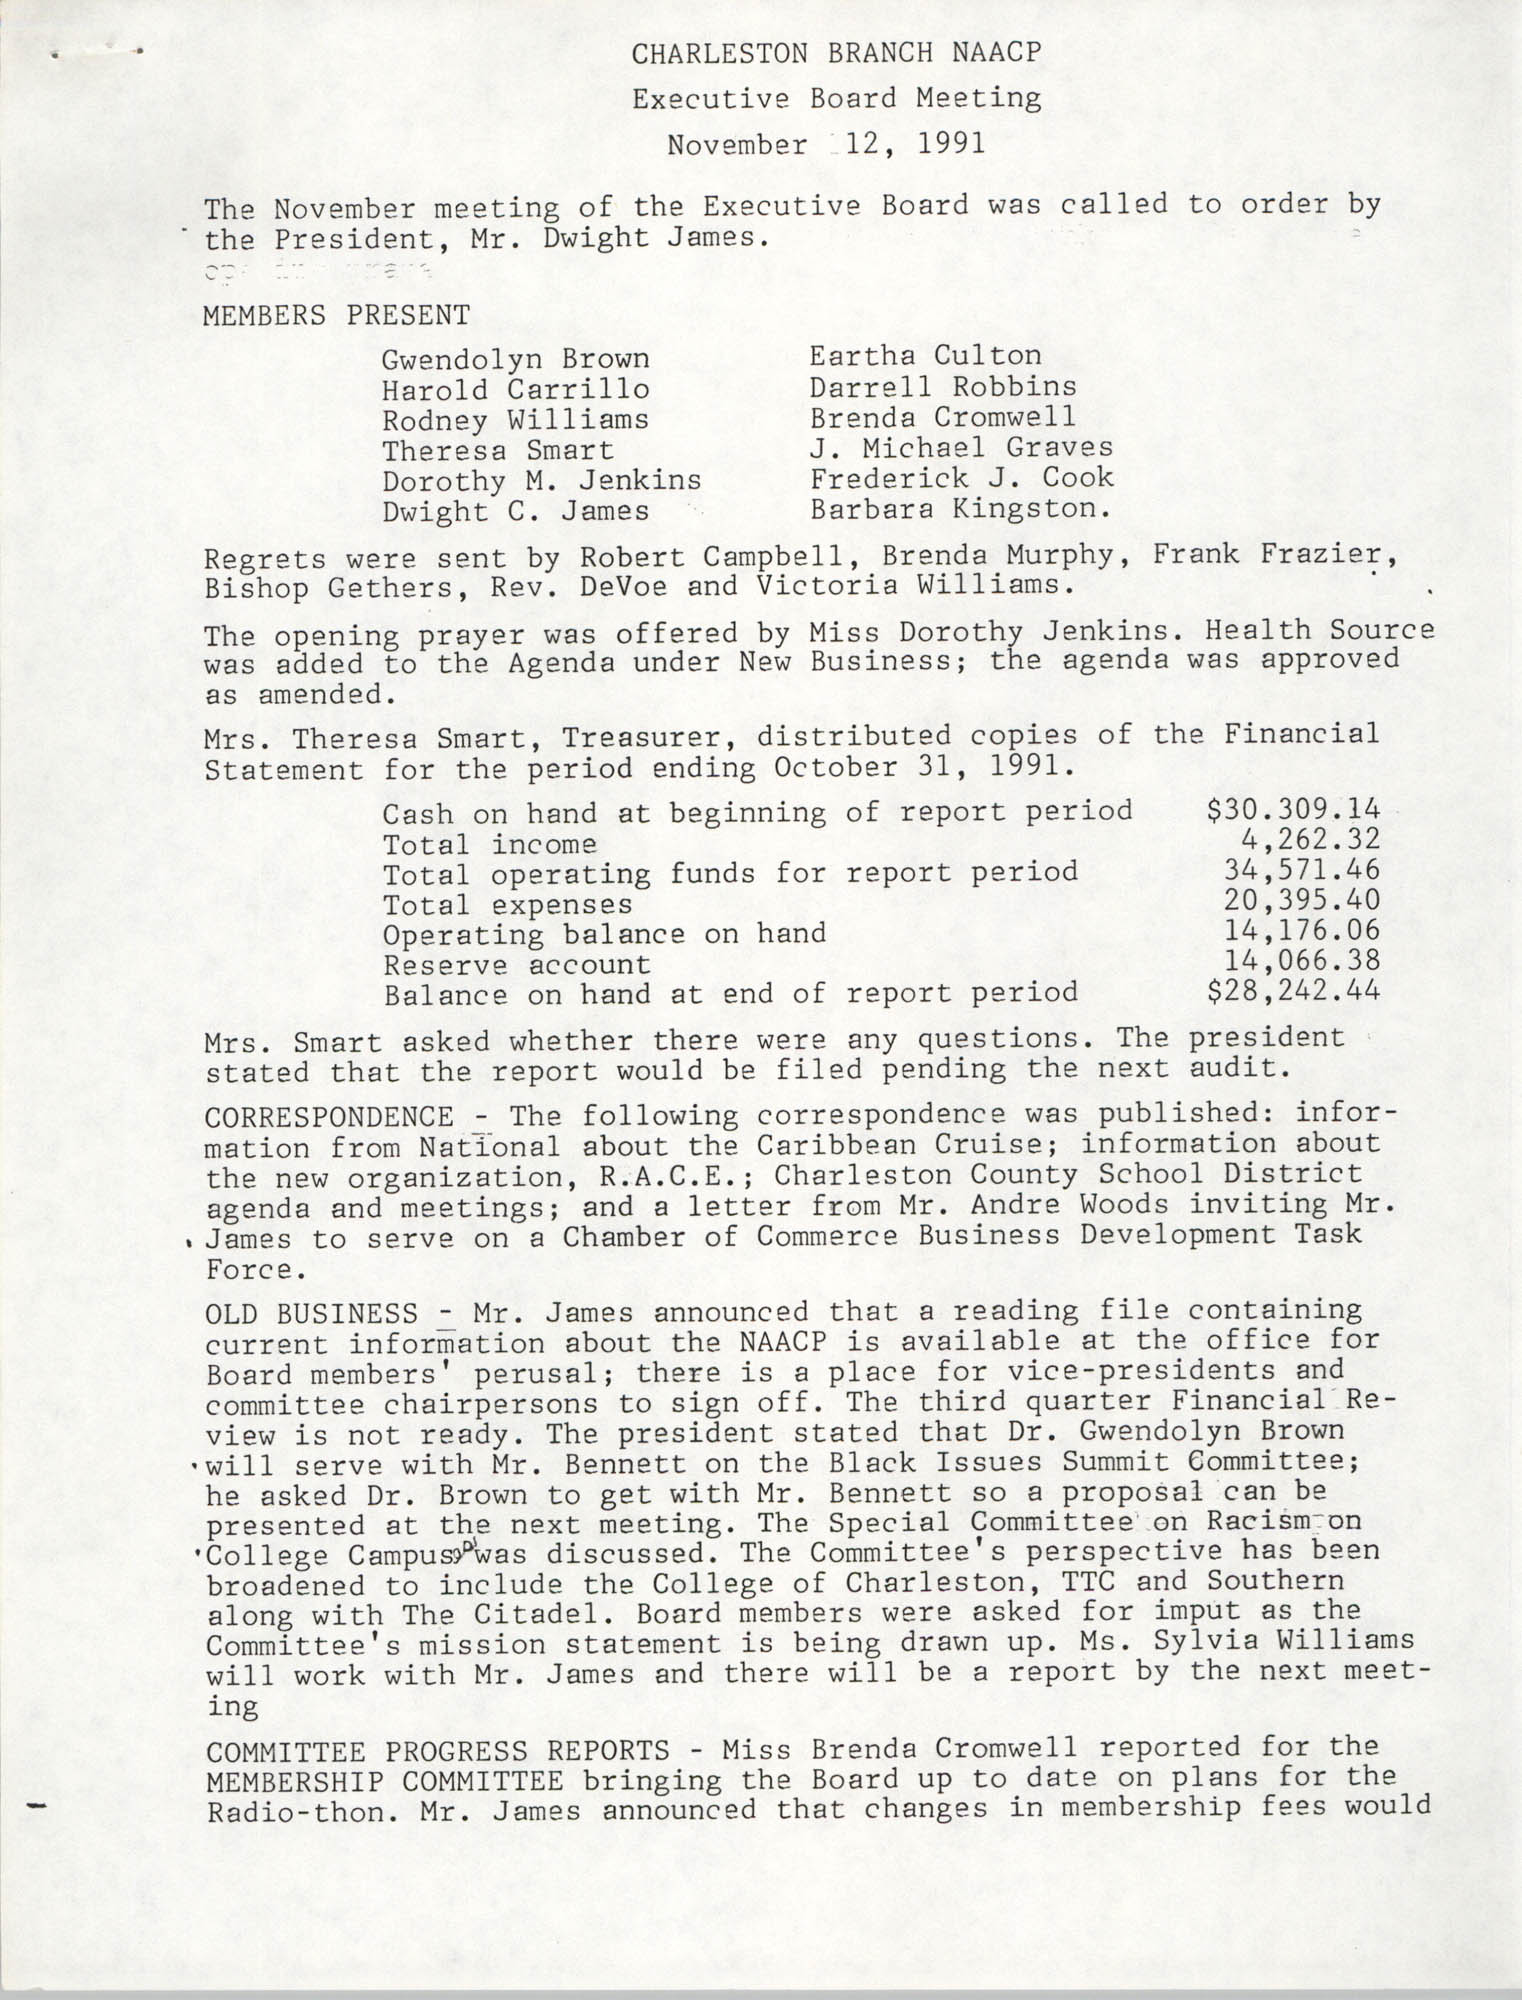 Minutes, Charleston Branch of the NAACP Executive Board Meeting, November 12, 1991